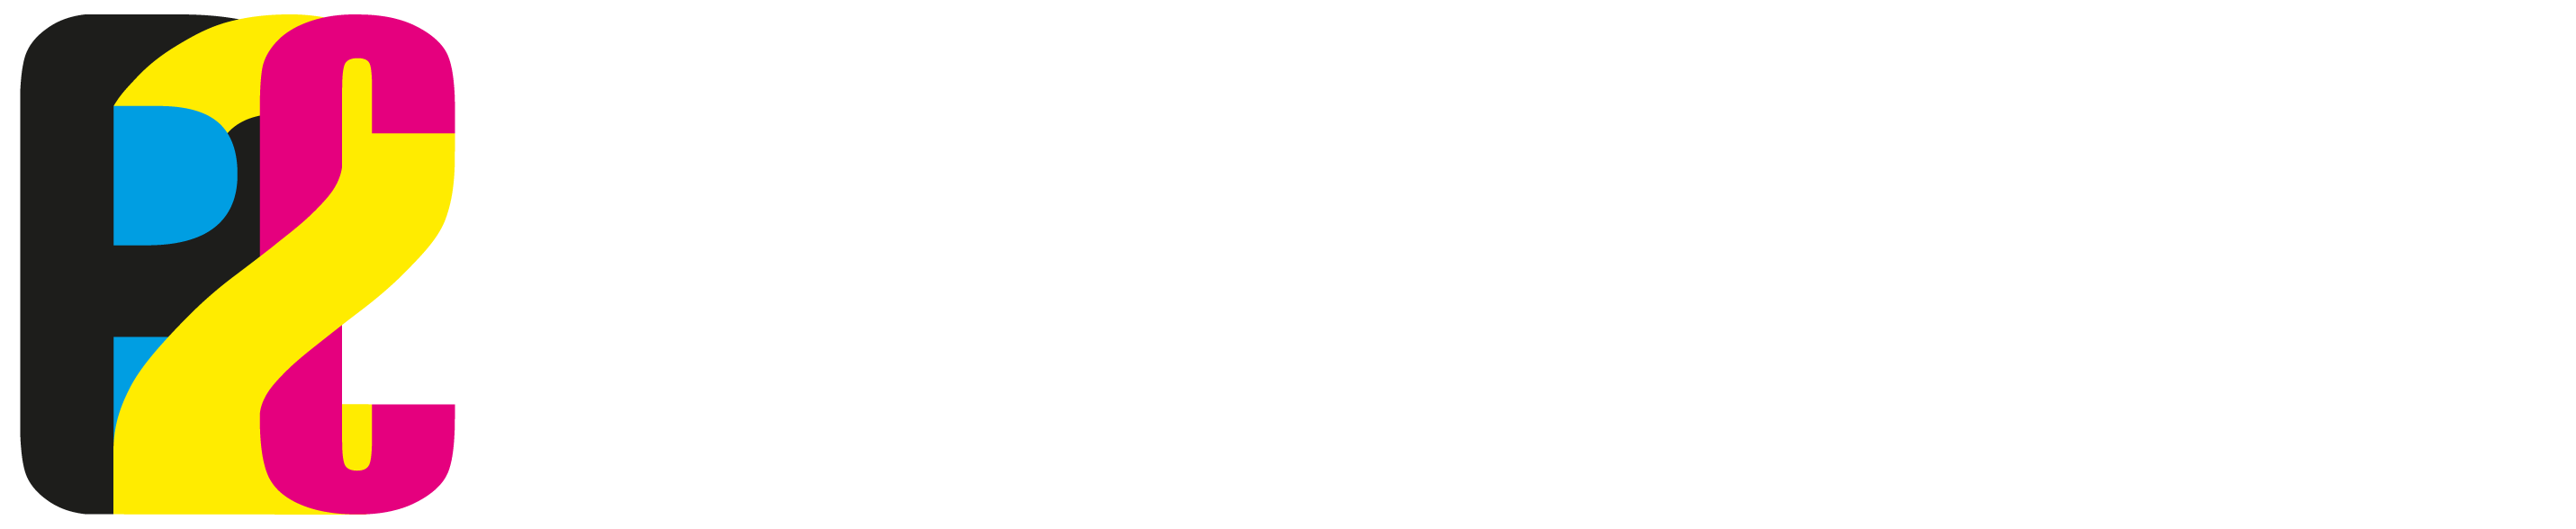 Pavement2Catwalk CIC